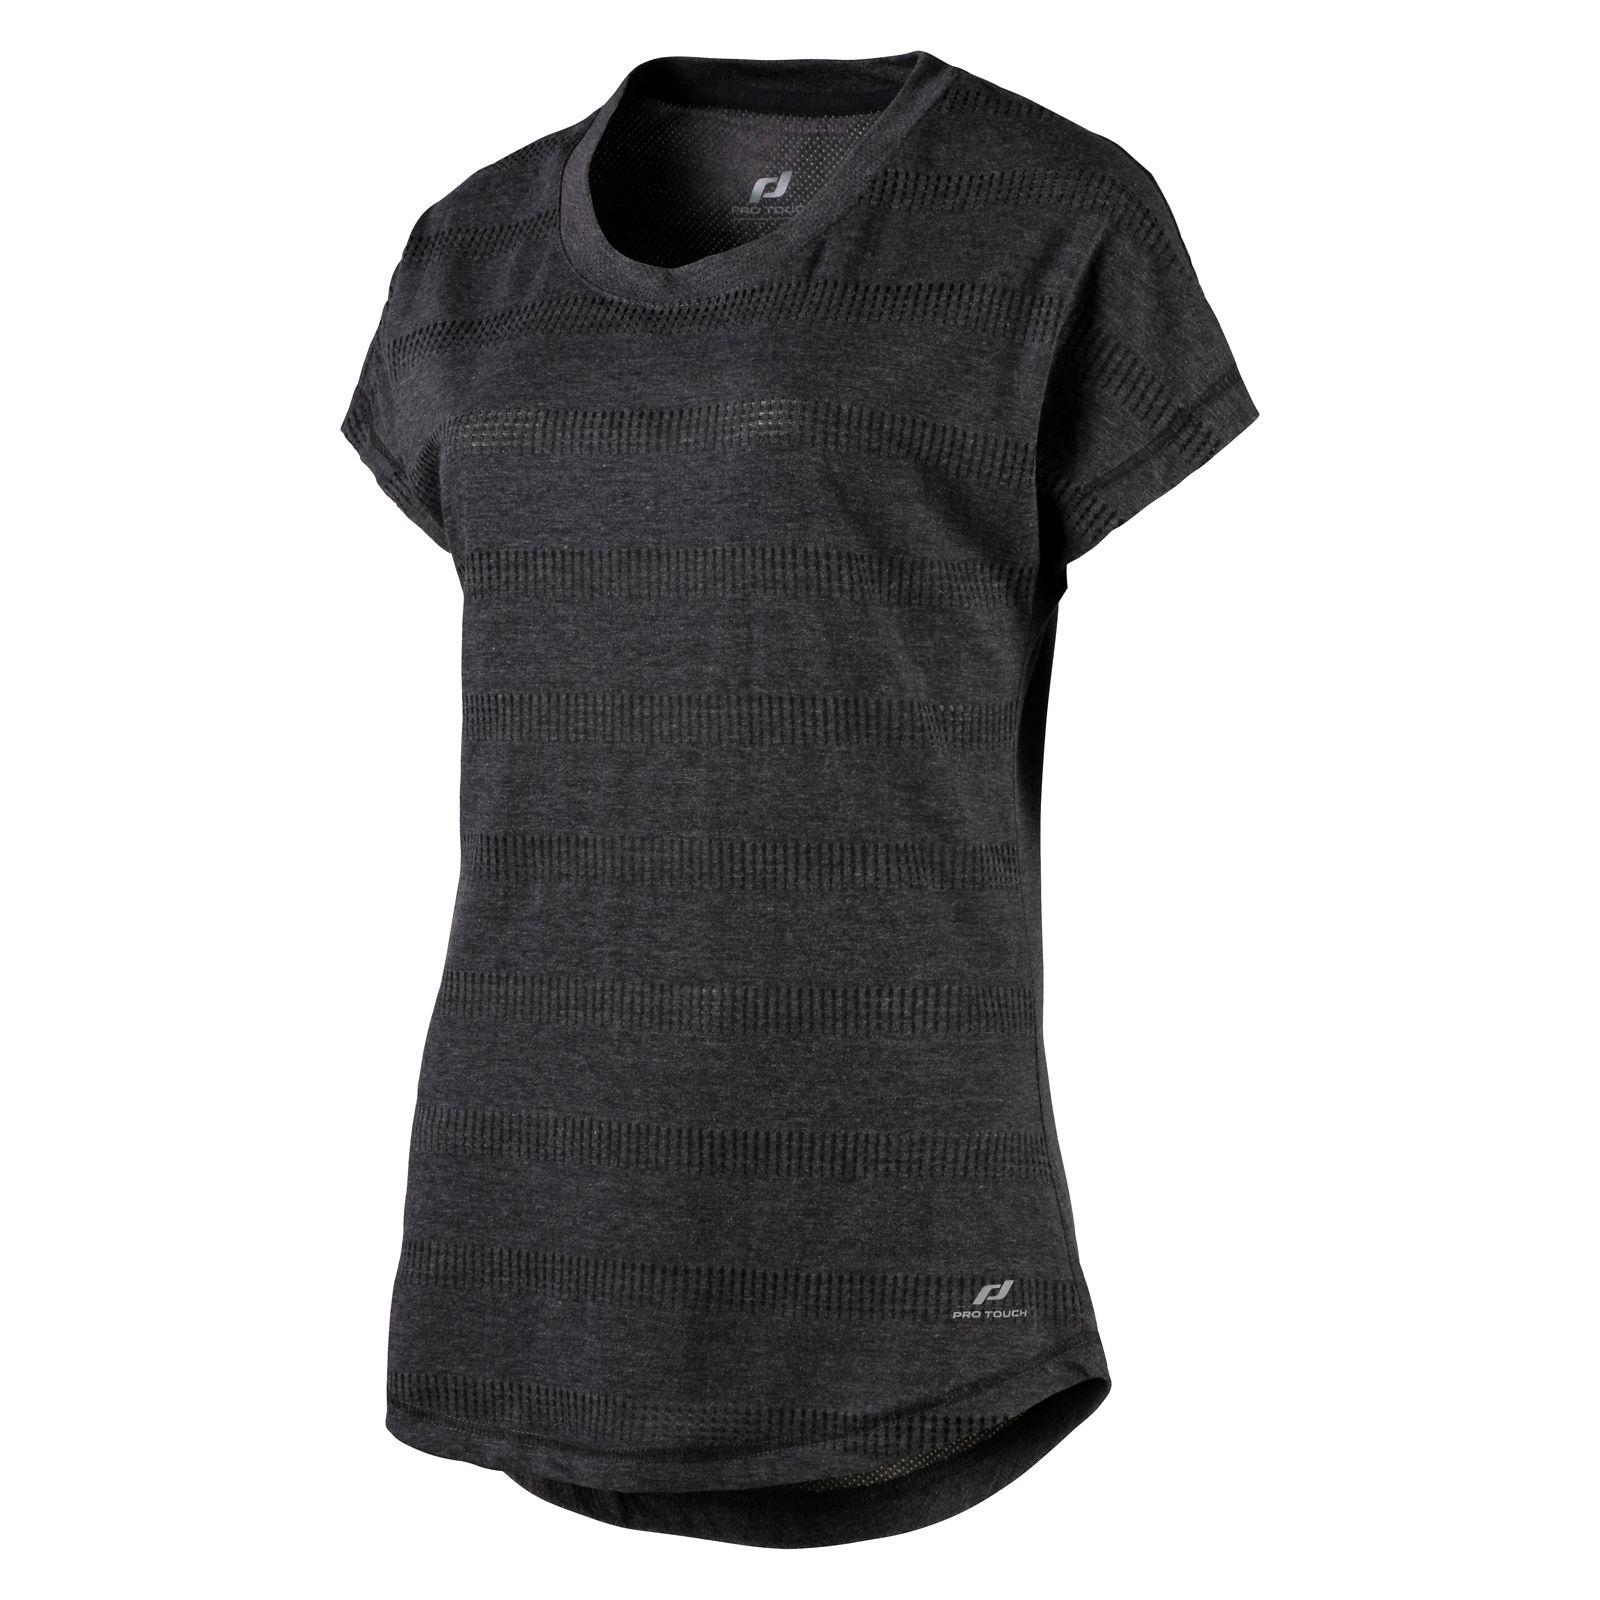 Koszulka damska do biegania Pro Touch Agny 285827